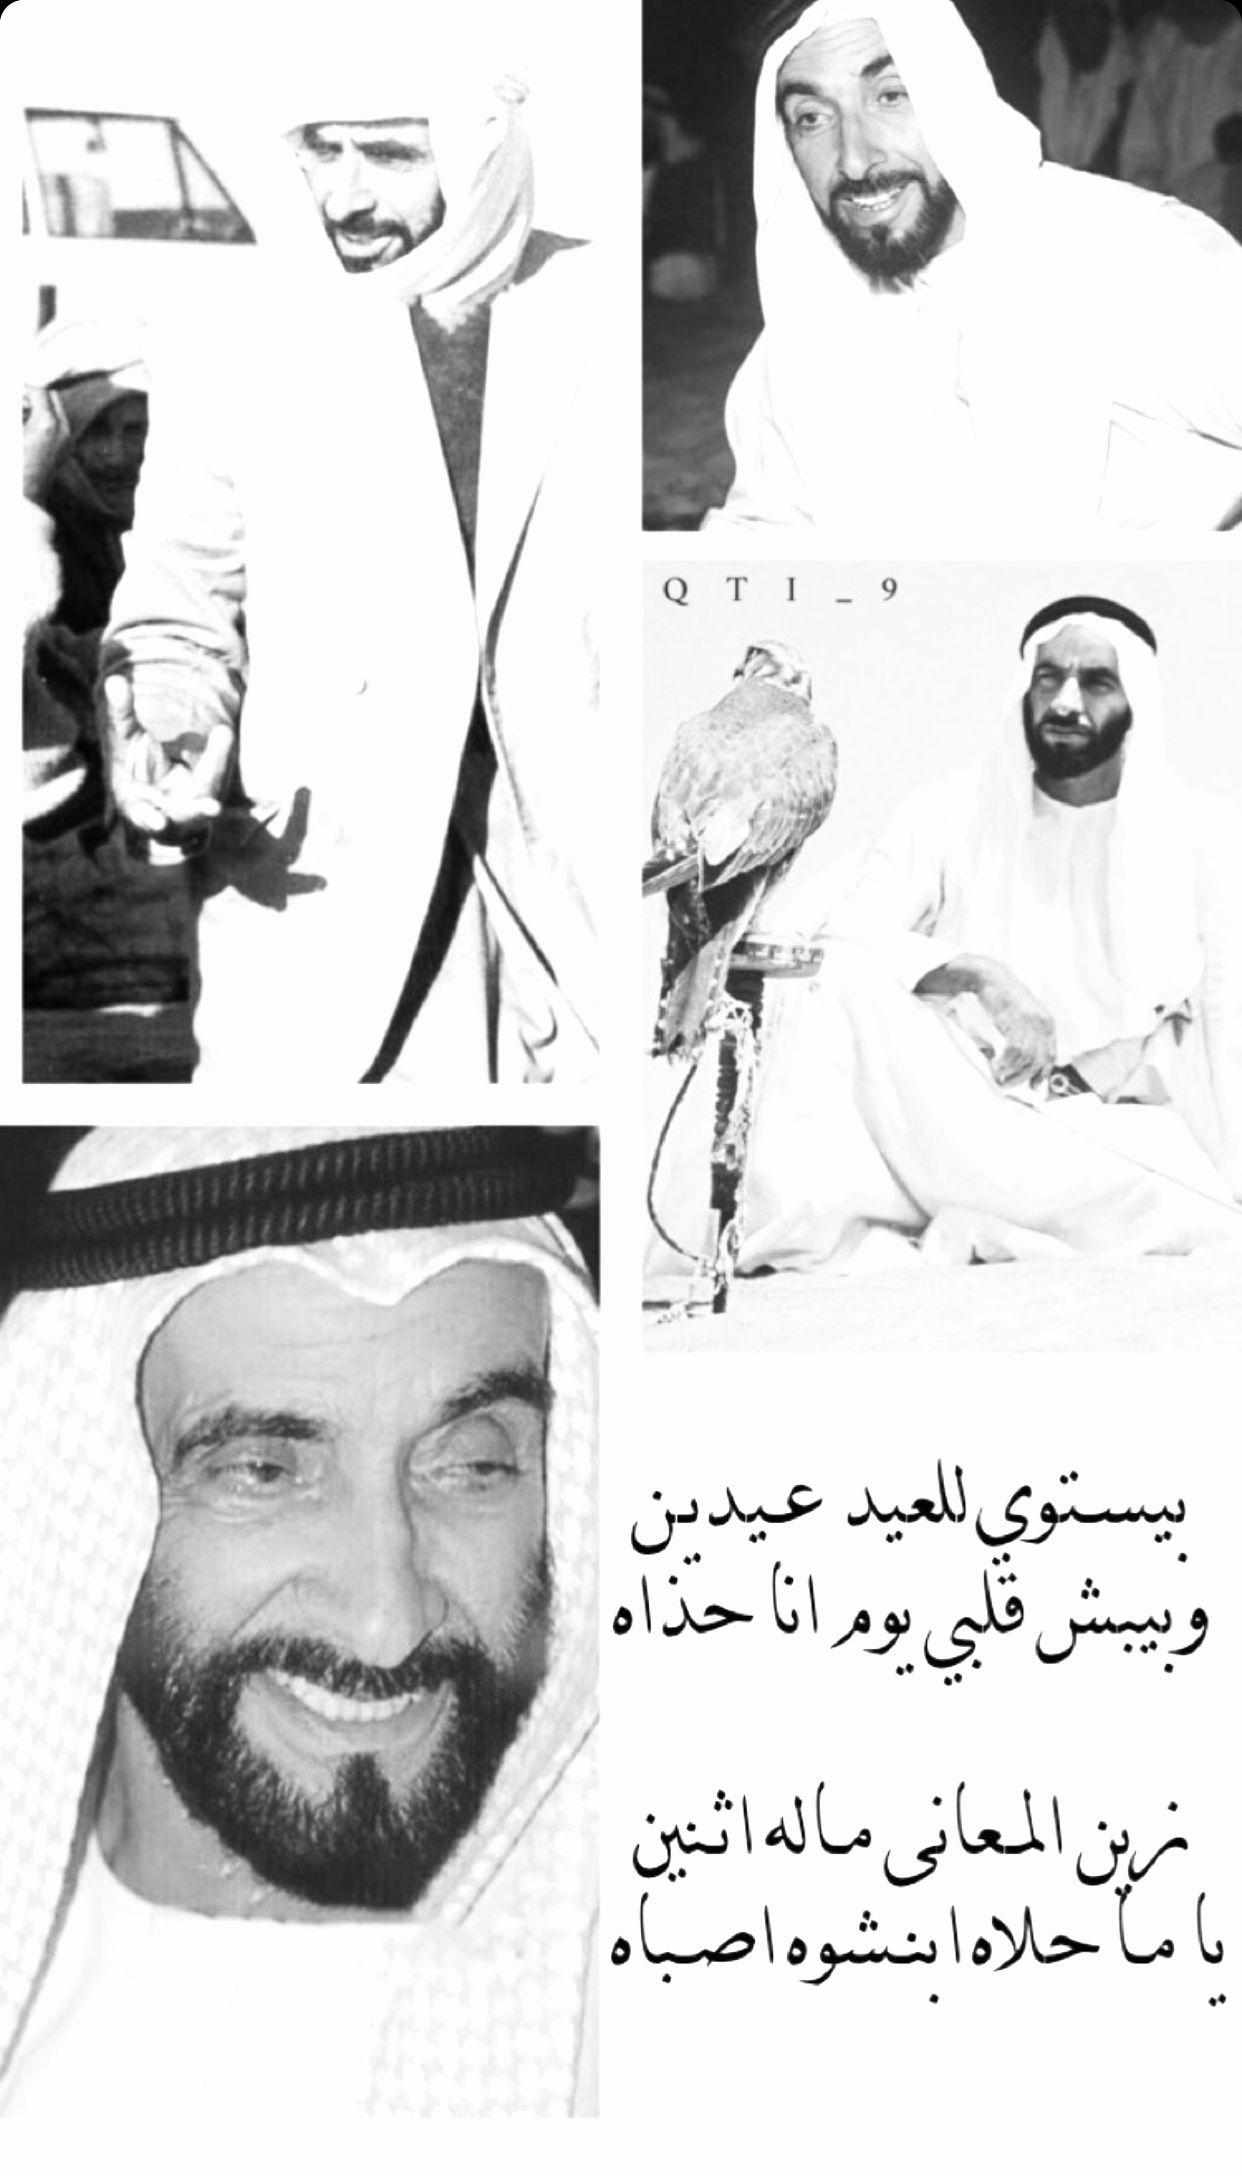 اللهم ارحم الشيخ زايد History Uae Beautiful Arabic Words Quran Quotes Inspirational